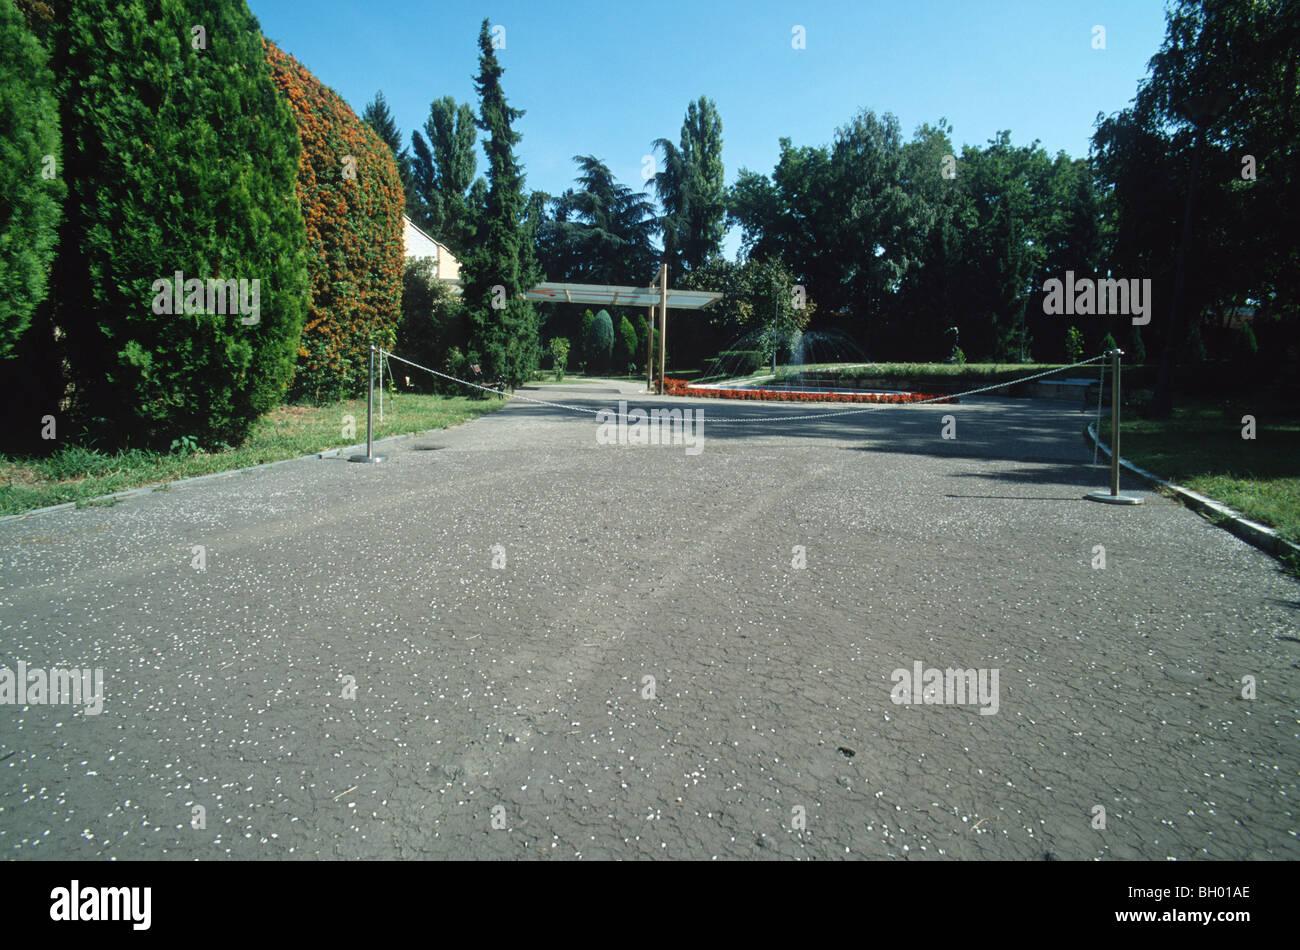 Entrance to the memorial of Josip Broz Tito, House of Flowers, Belgrade, Serbia, Balkans Stock Photo